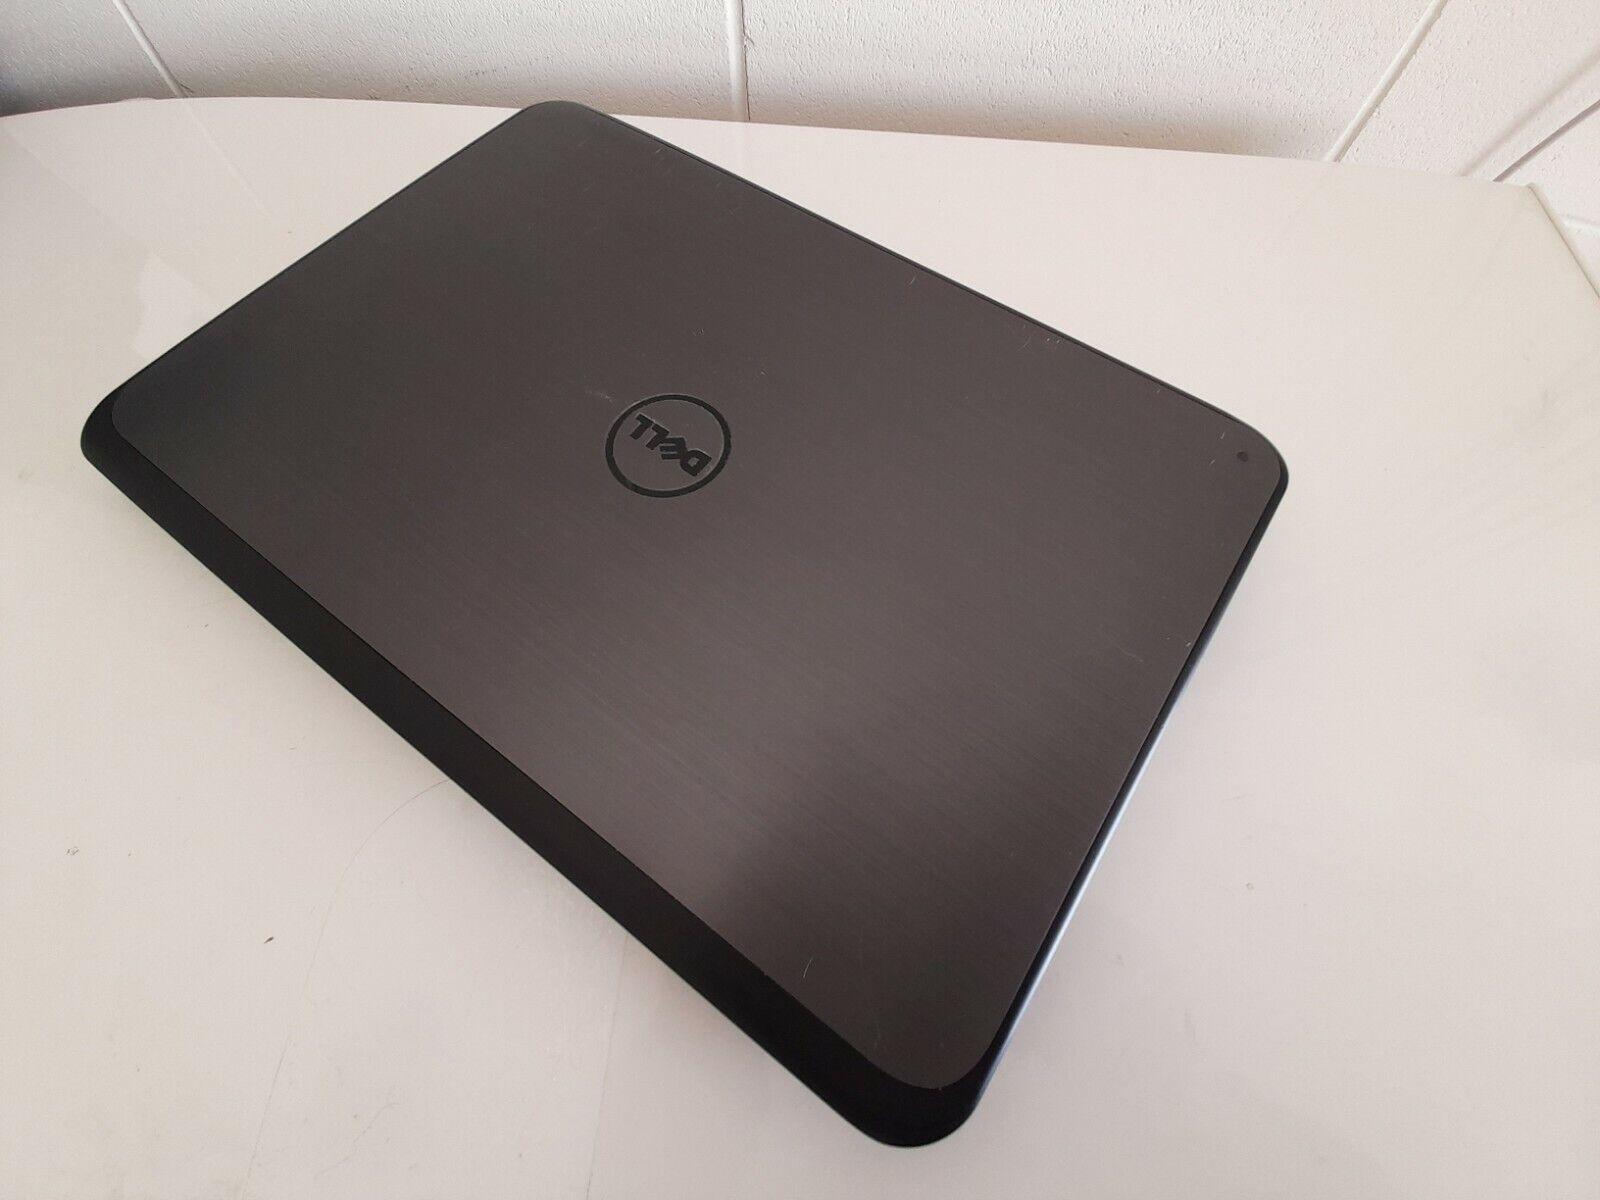 "Laptop Windows - Dell Latitude 3540 Core i3 G4, 8GB RAM, 500GB hard drive, Windows 10, 15.5"""